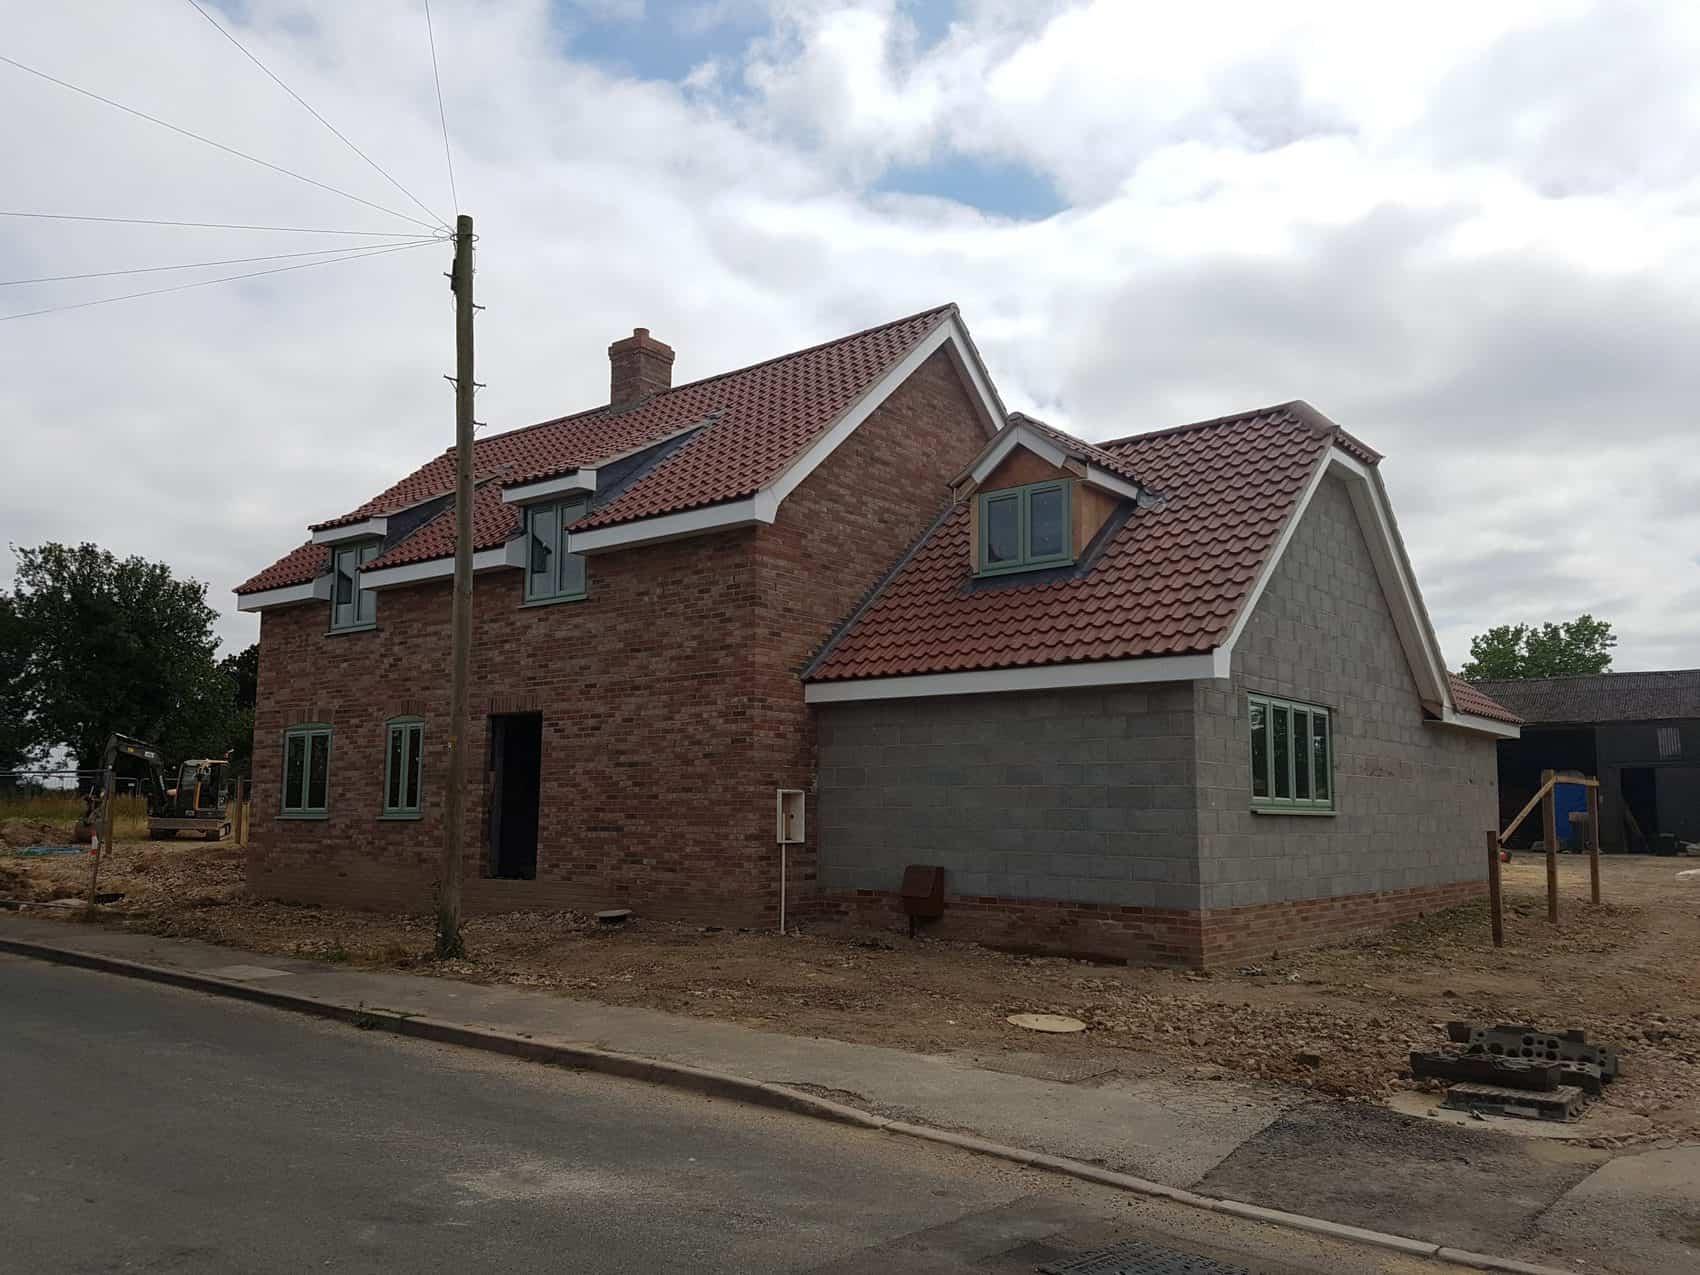 upward-barn conversions-traditional build-plot2-3-min